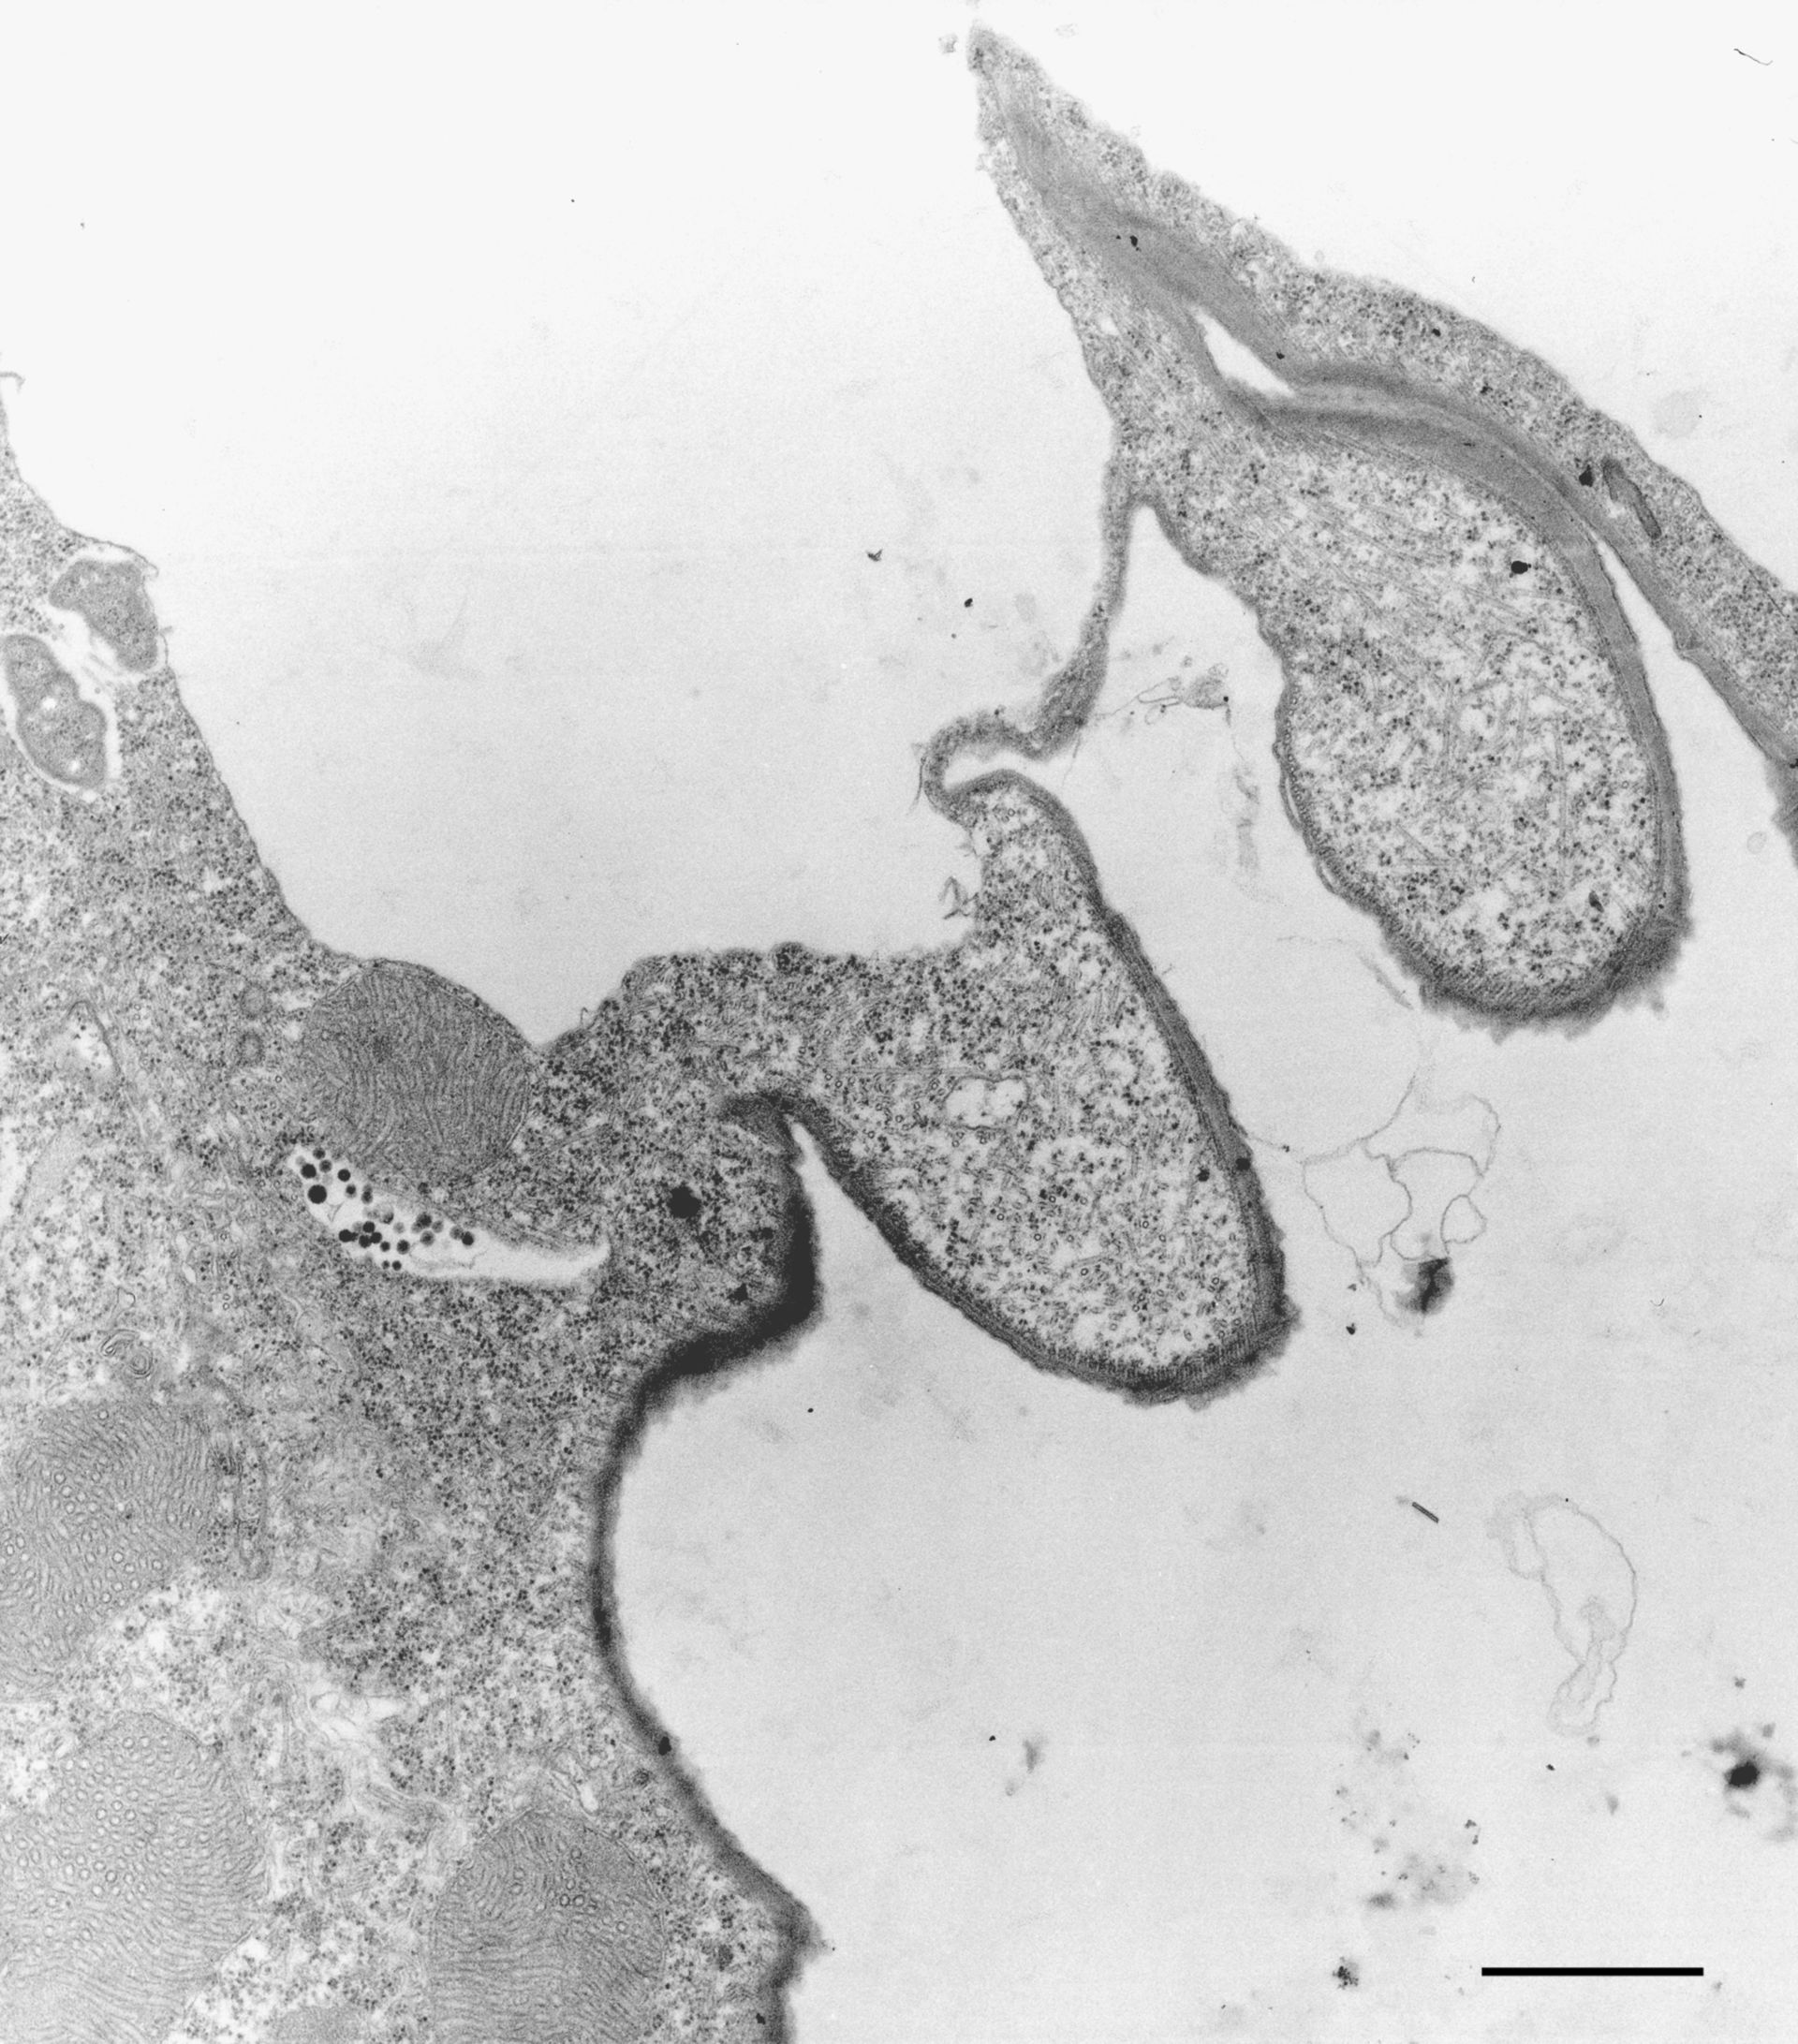 Euplotes sp. (Microtubule) - CIL:9907